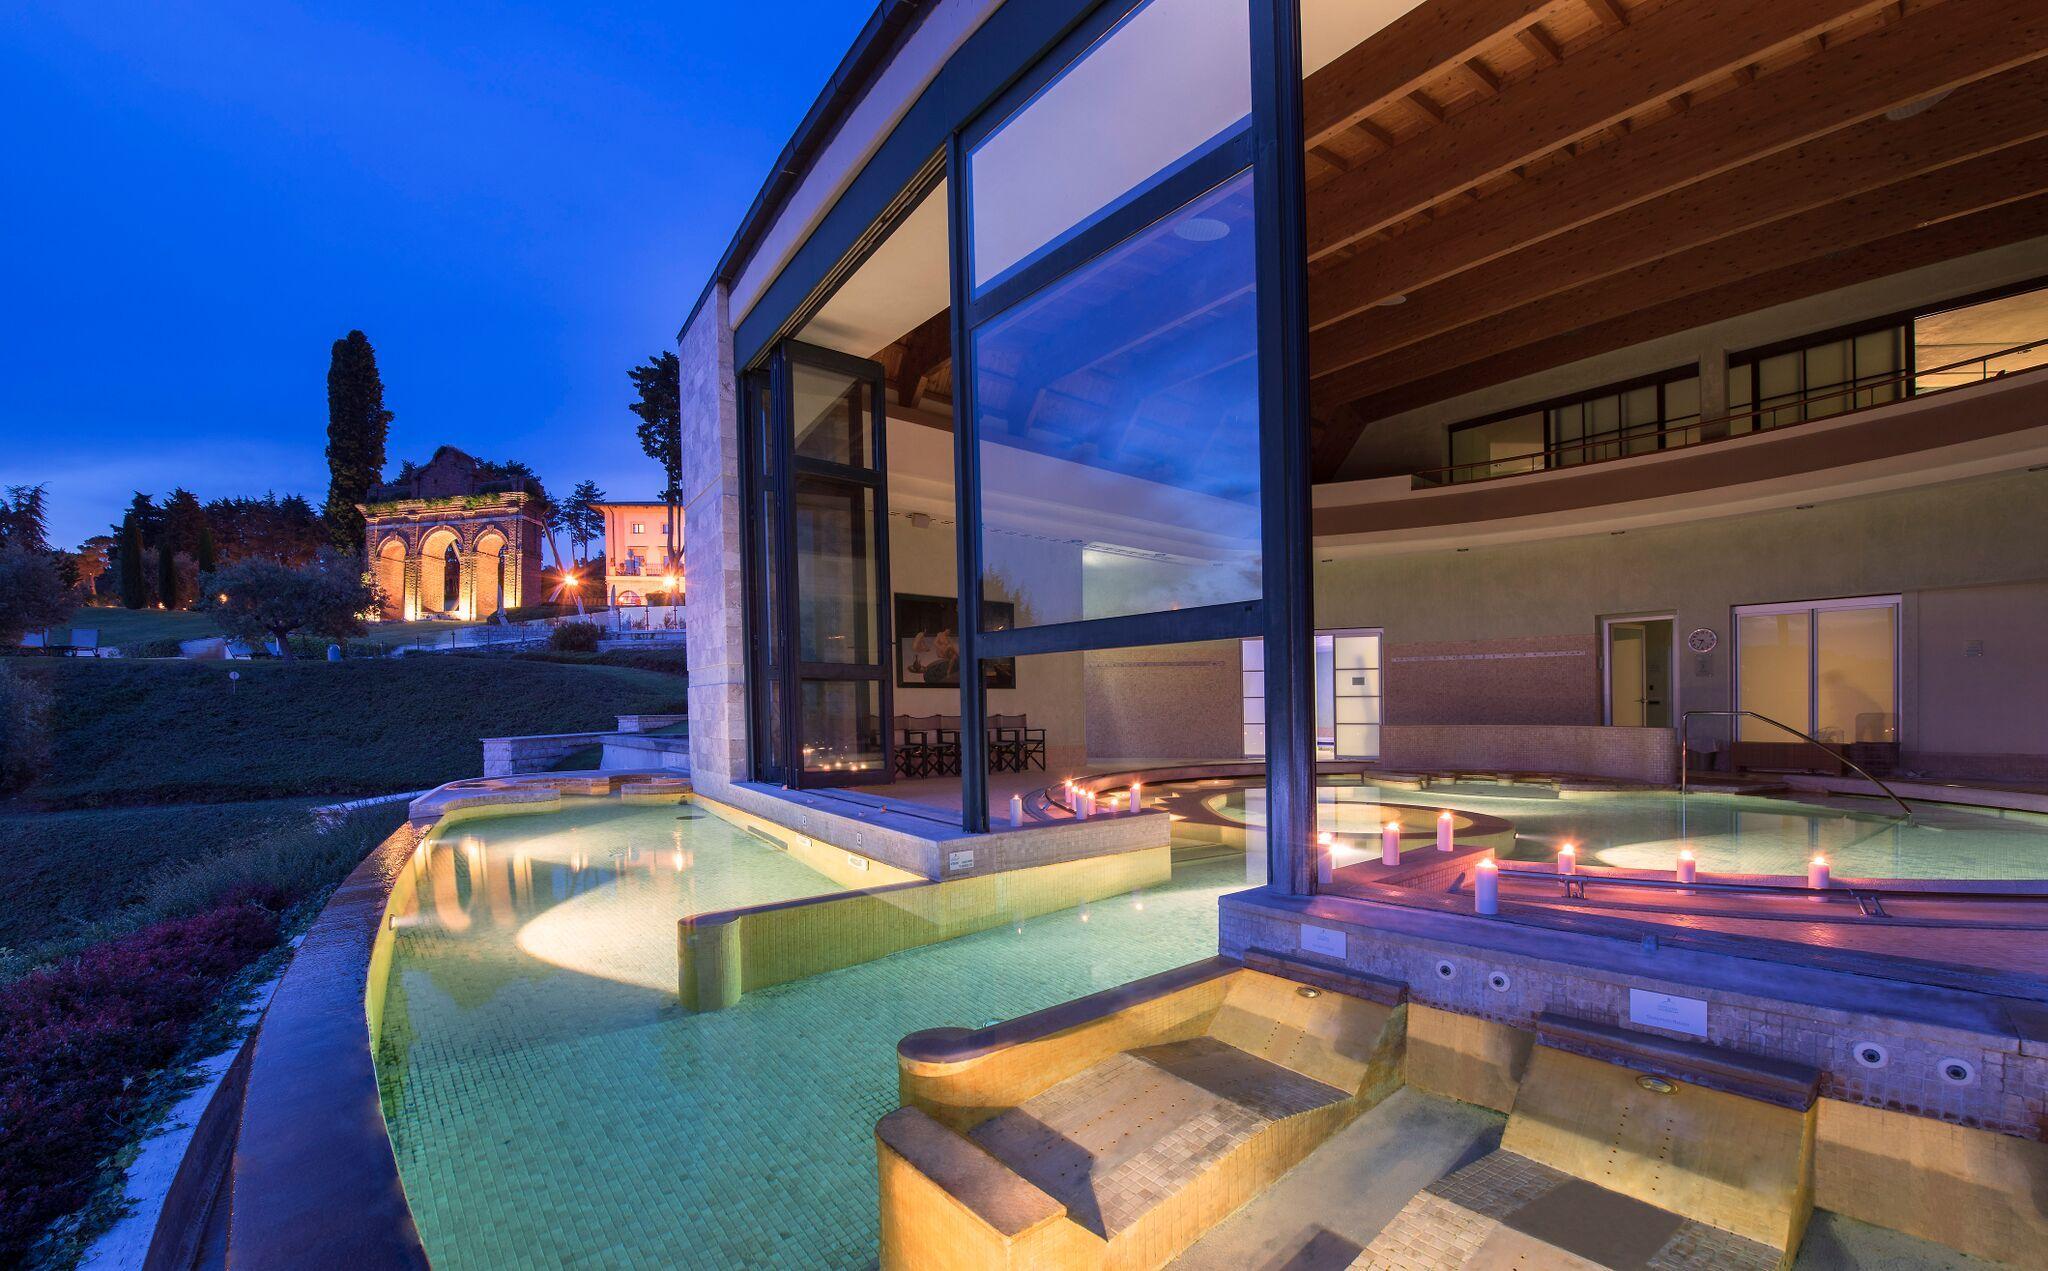 Fonteverde Terme  U0026 Hotel  San Casciano Dei Bagni